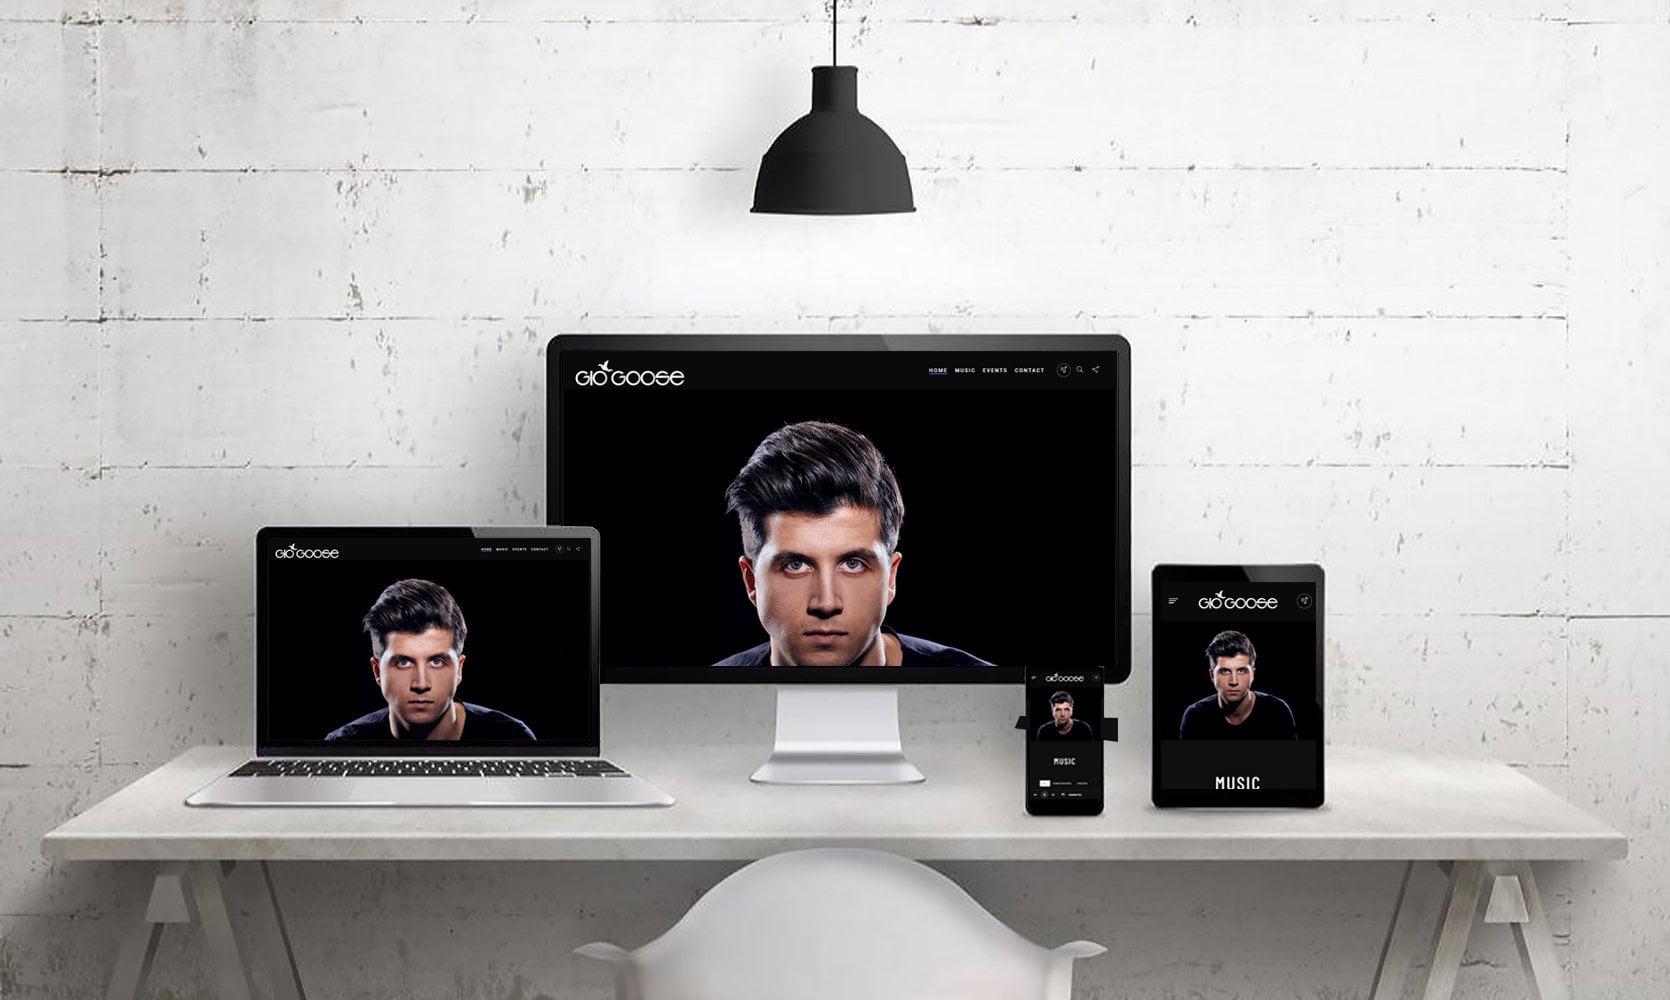 Webdesign Mockup GioGoose